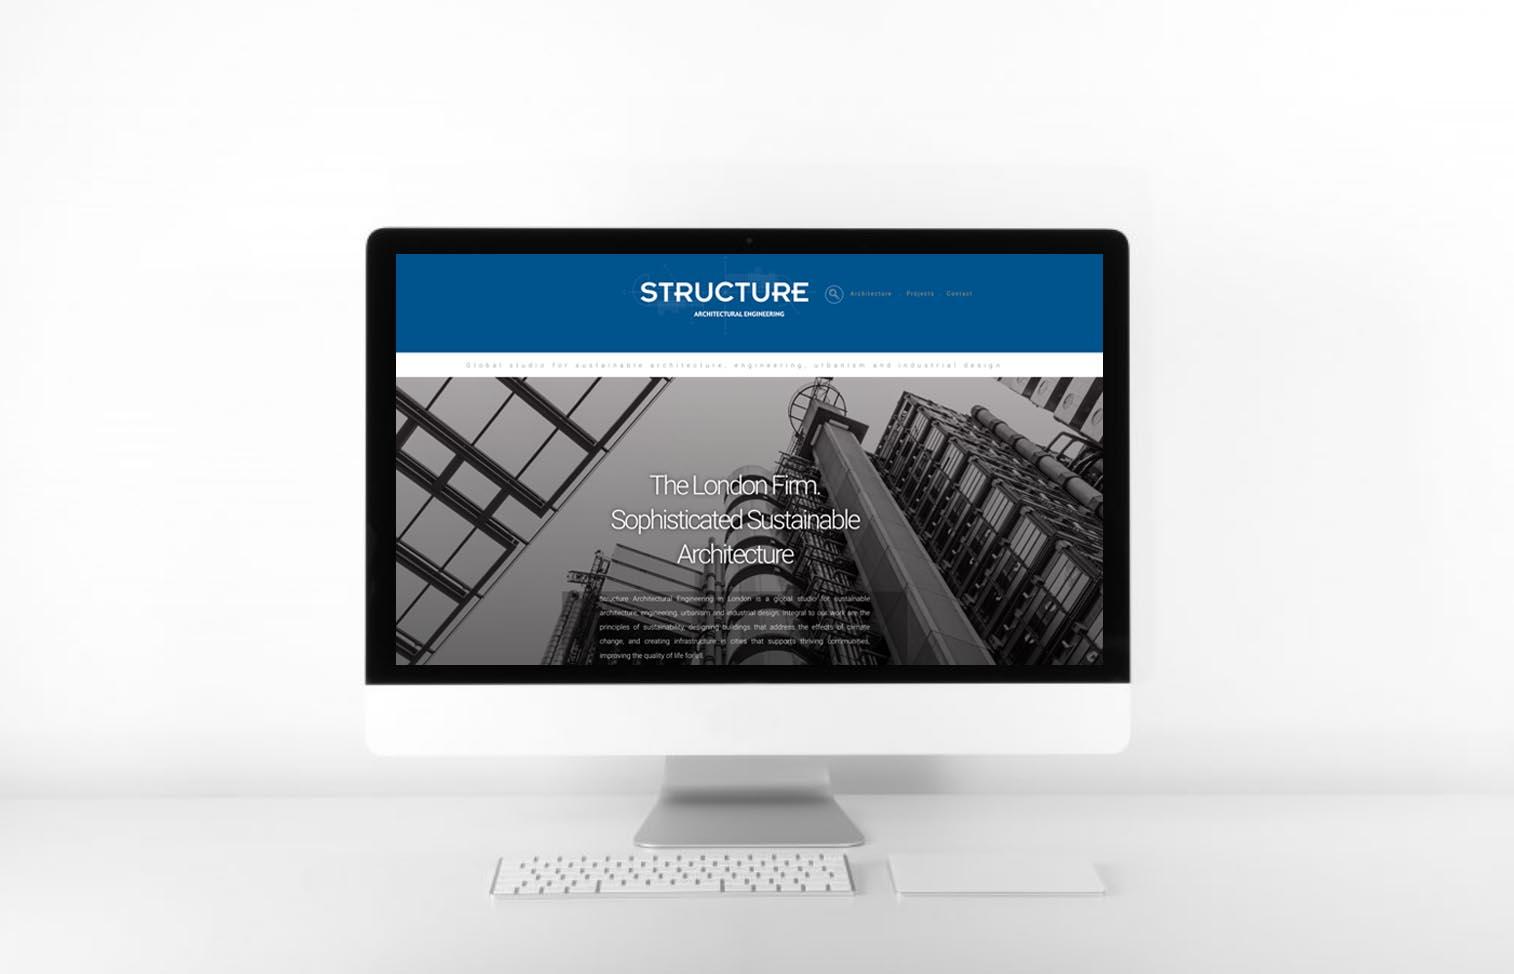 desktop-structure-website-design-company